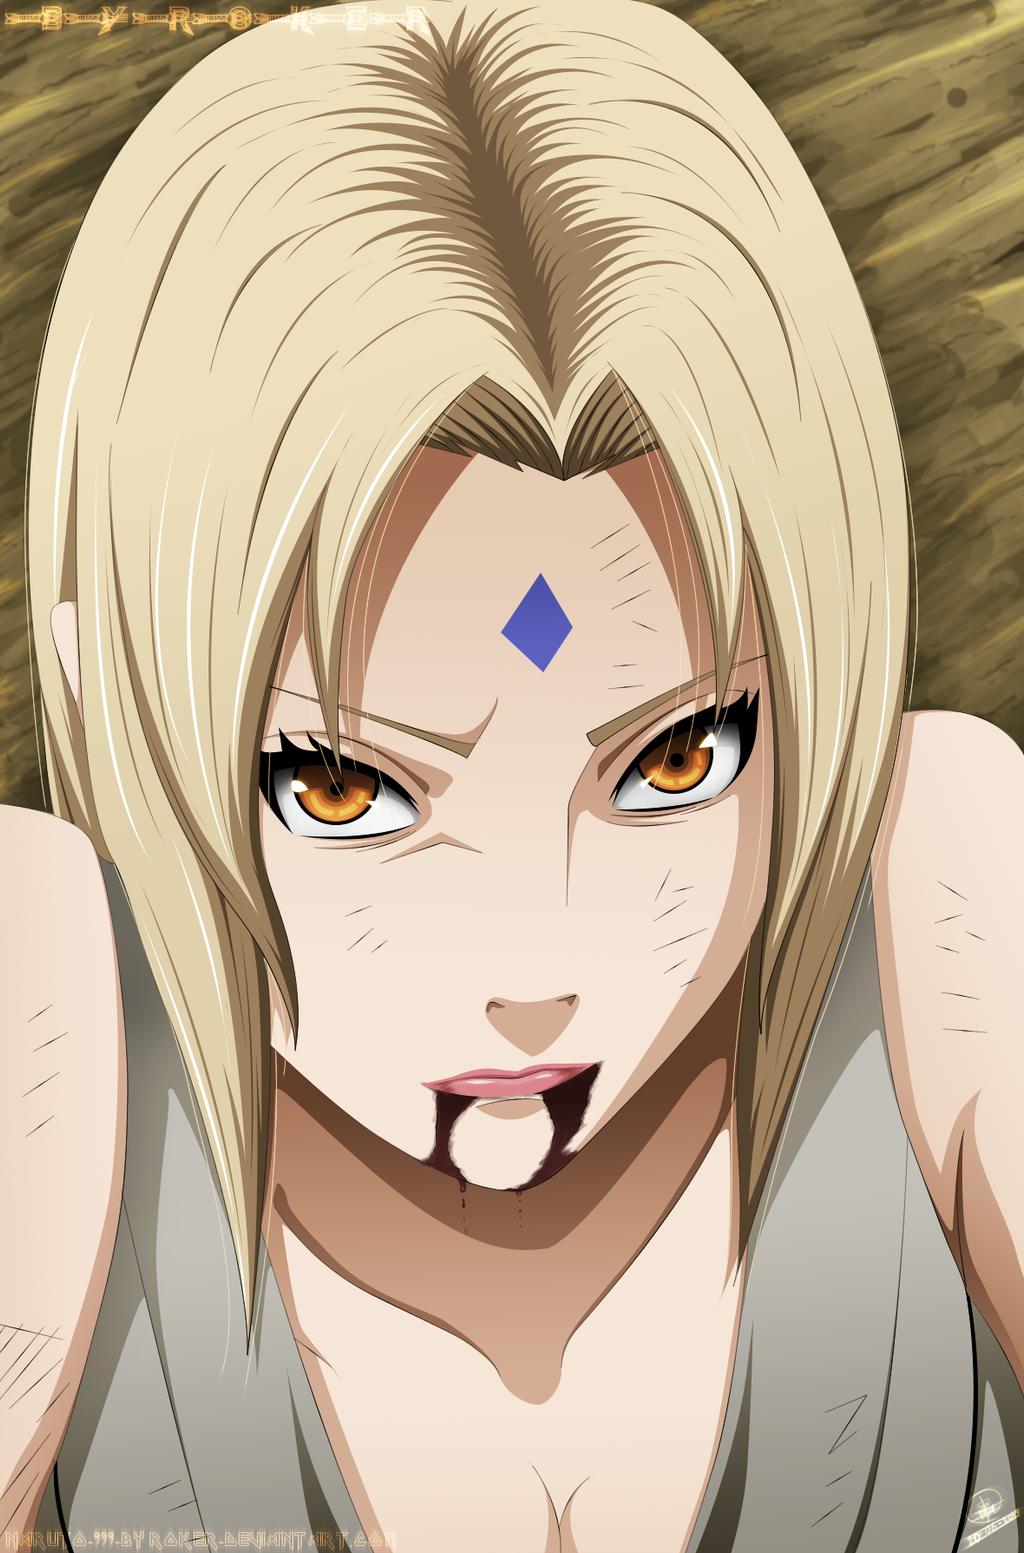 TSUNADE-(Manga-635) by NARUTO999-BY-ROKER on DeviantArt